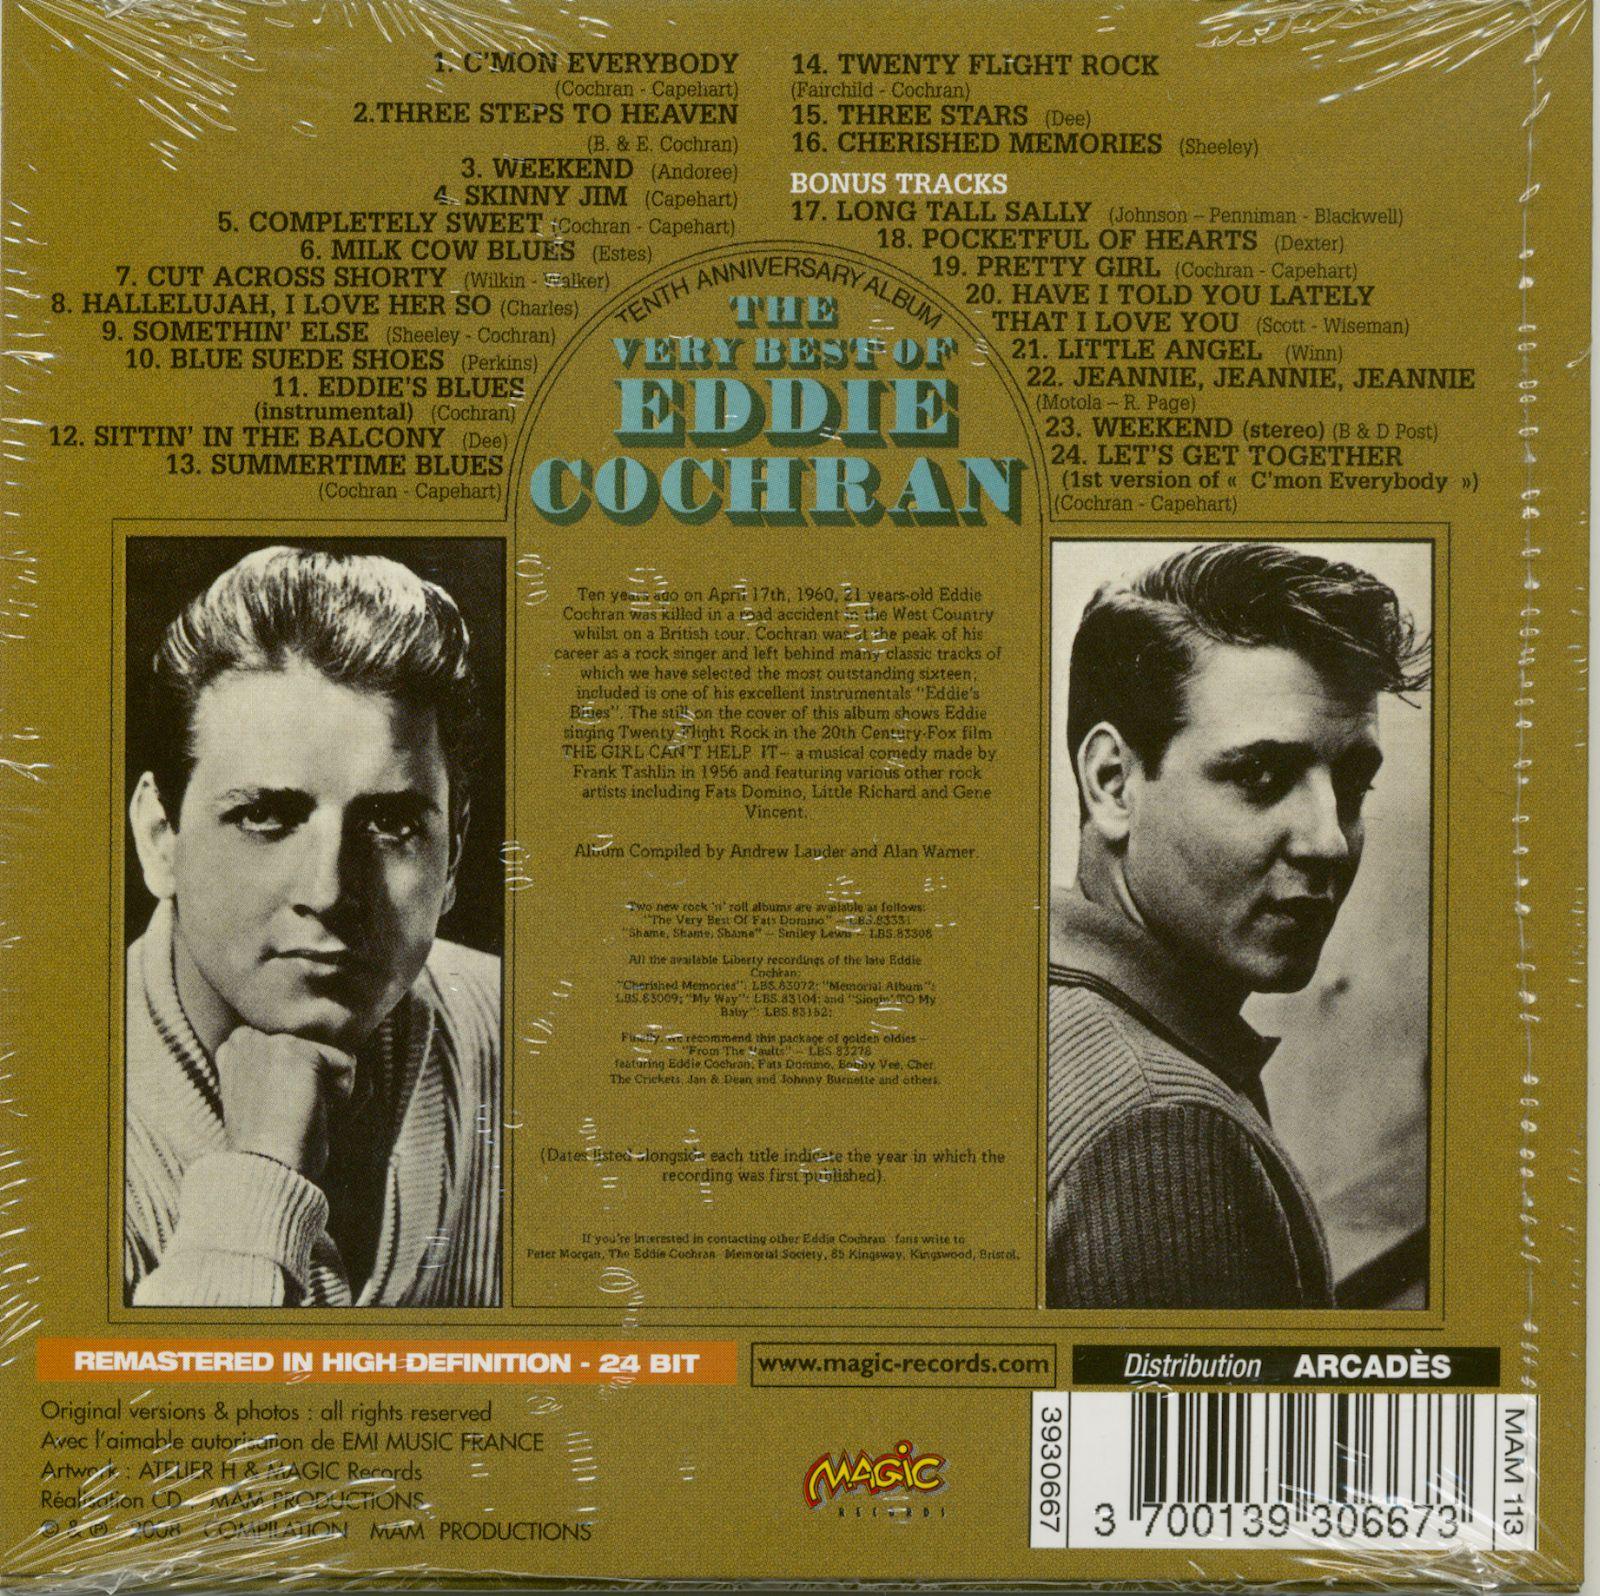 Eddie Cochran Cd Cochran Eddie 10th Anniversary Very